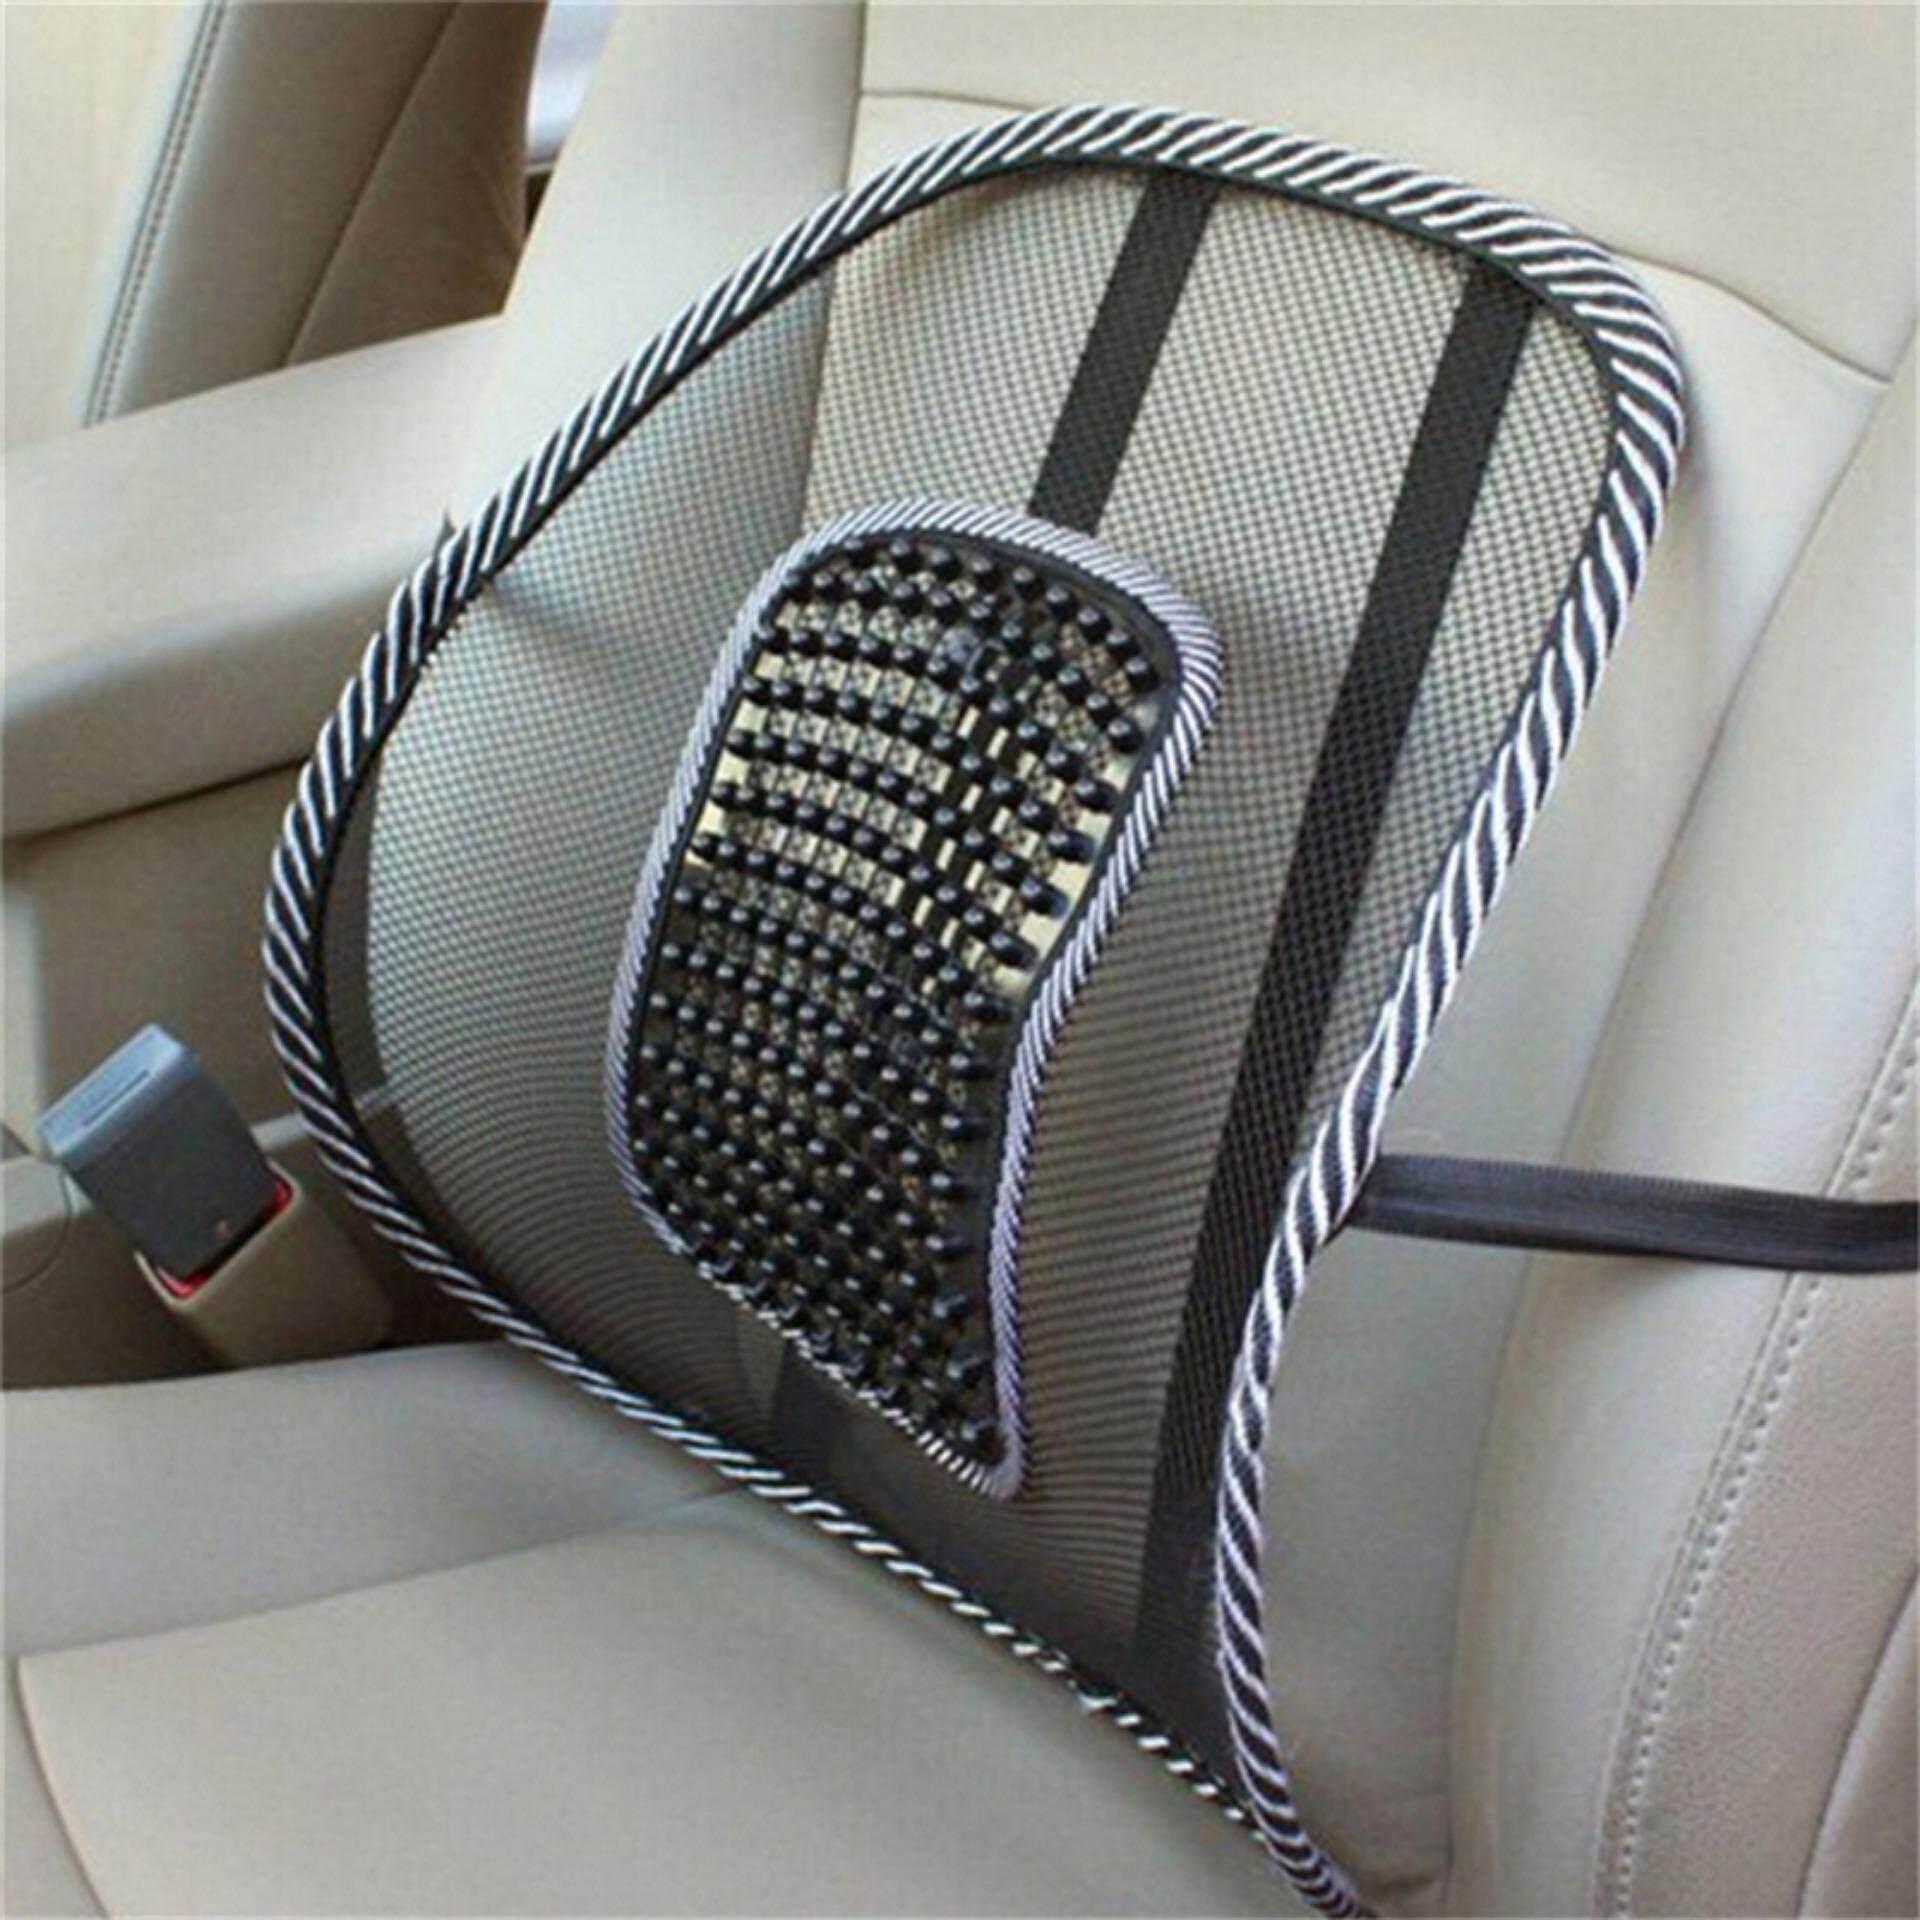 Mesh Lumbar Seat Back Support Senderan Kursi Jok Mobil Kesehatan Sandaran Penyanggan Punggung Autocar Sarung Gambar Produk Penyangga Hitam Selengkapnya Source Massage Vent Lower Brace